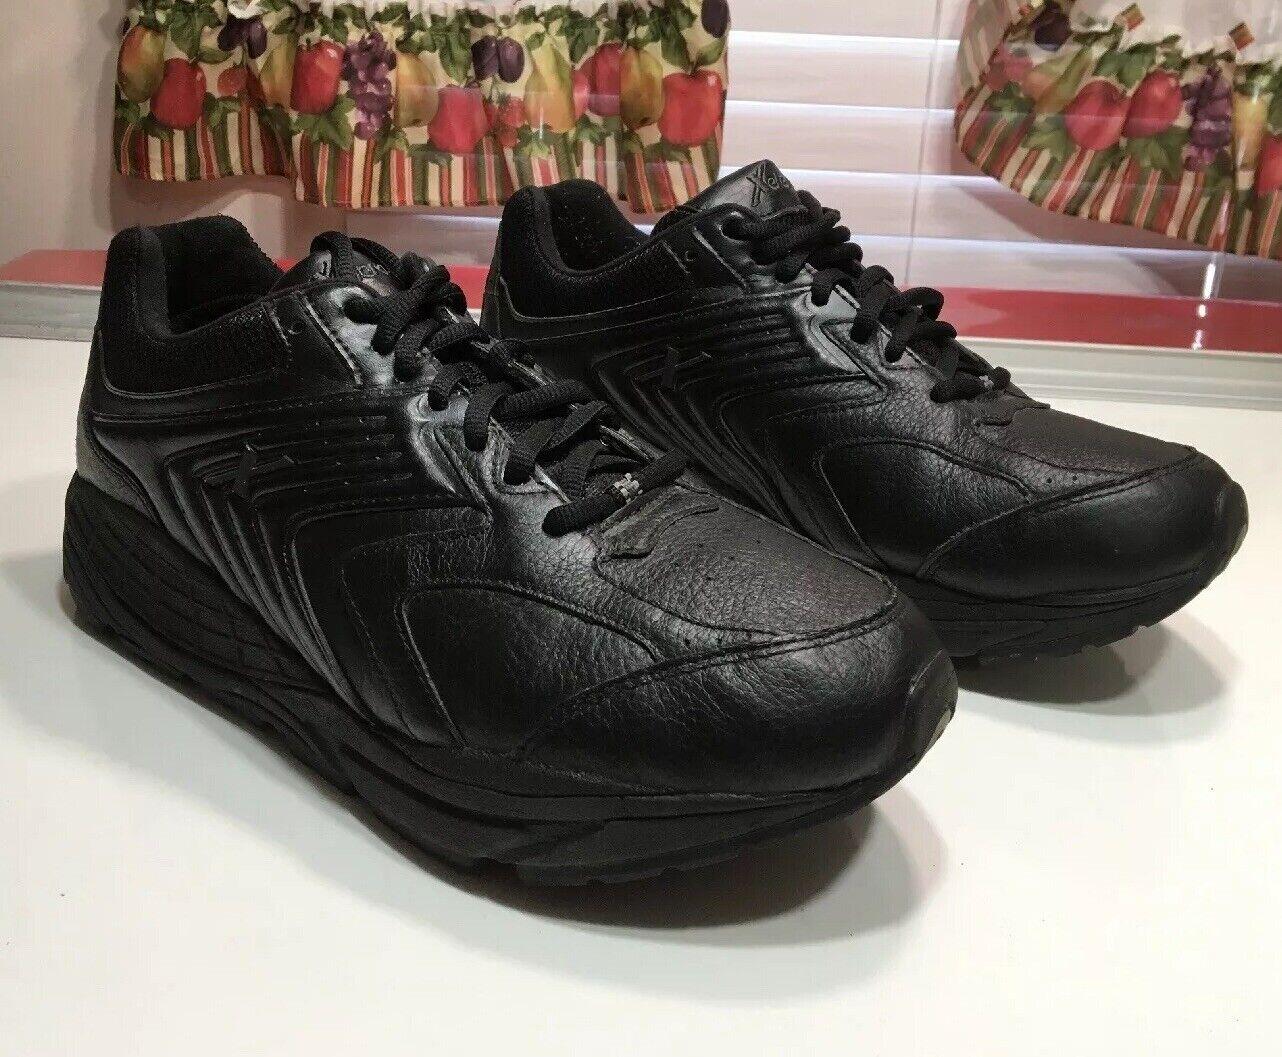 276-Xelero Matrix Men's Comfort scarpe da ginnastica nero Coloree scarpe US 11